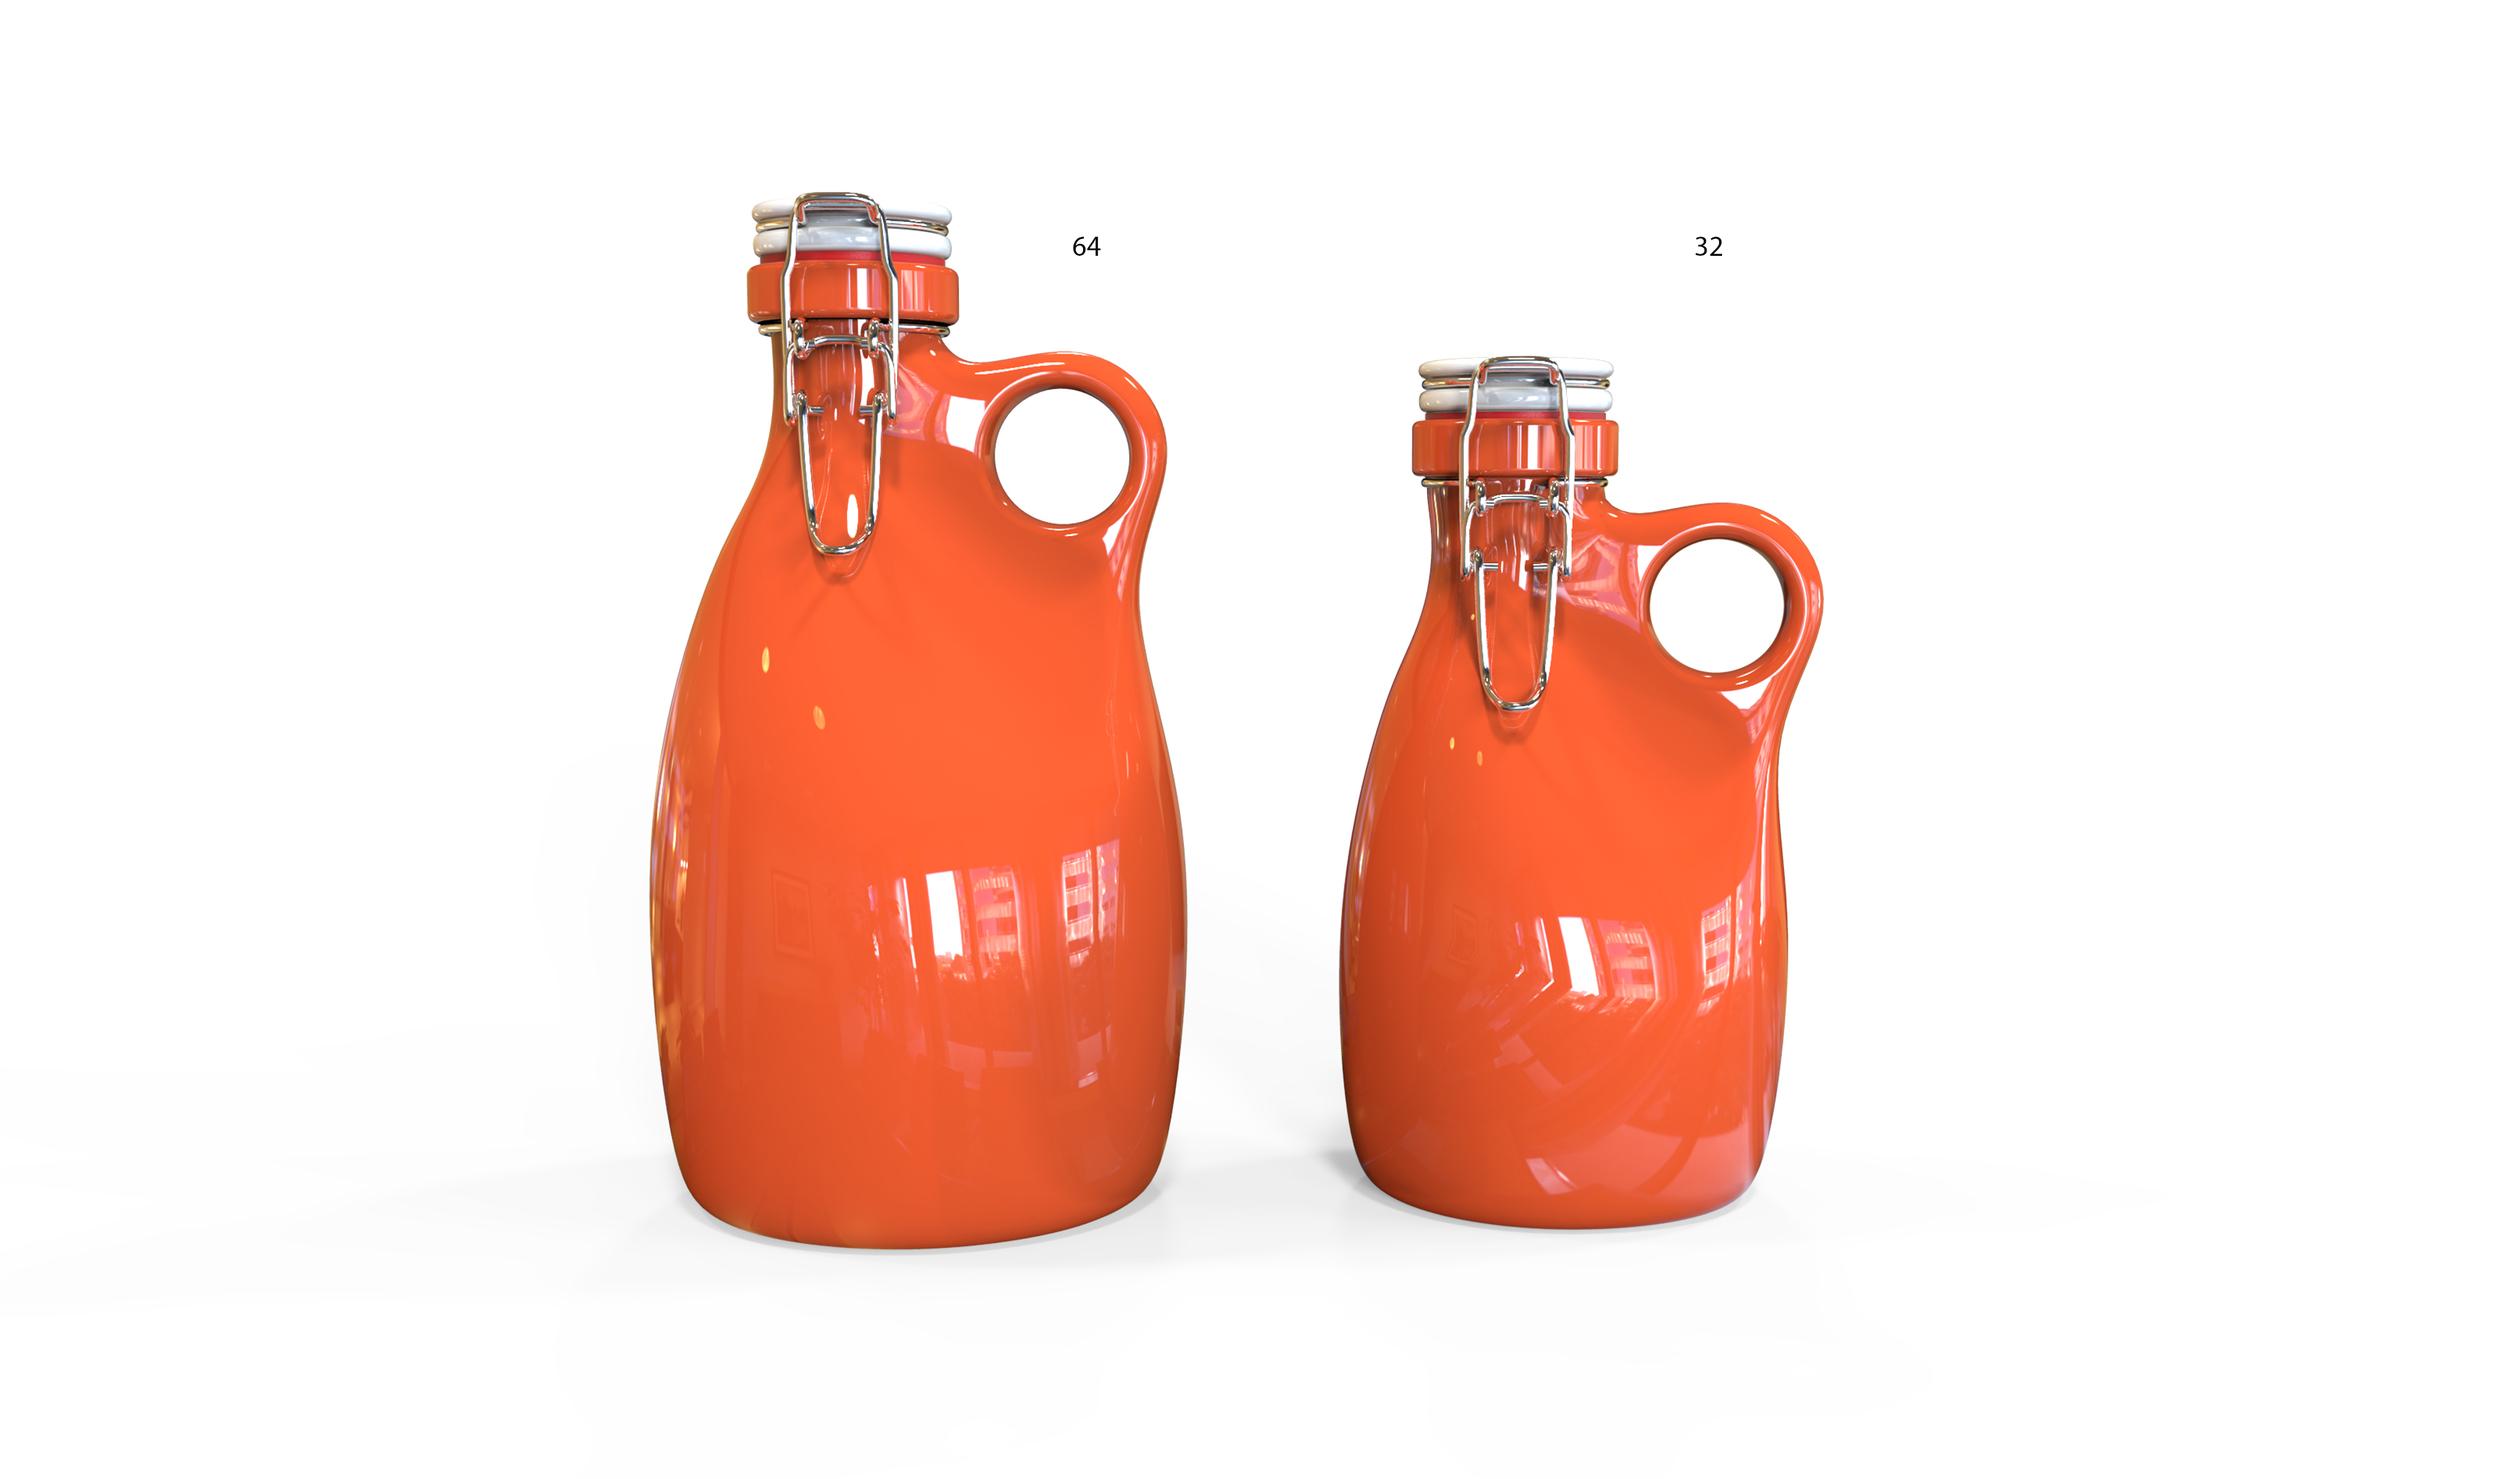 OrangeVessel_growler_32oz_prototype_craft_beer